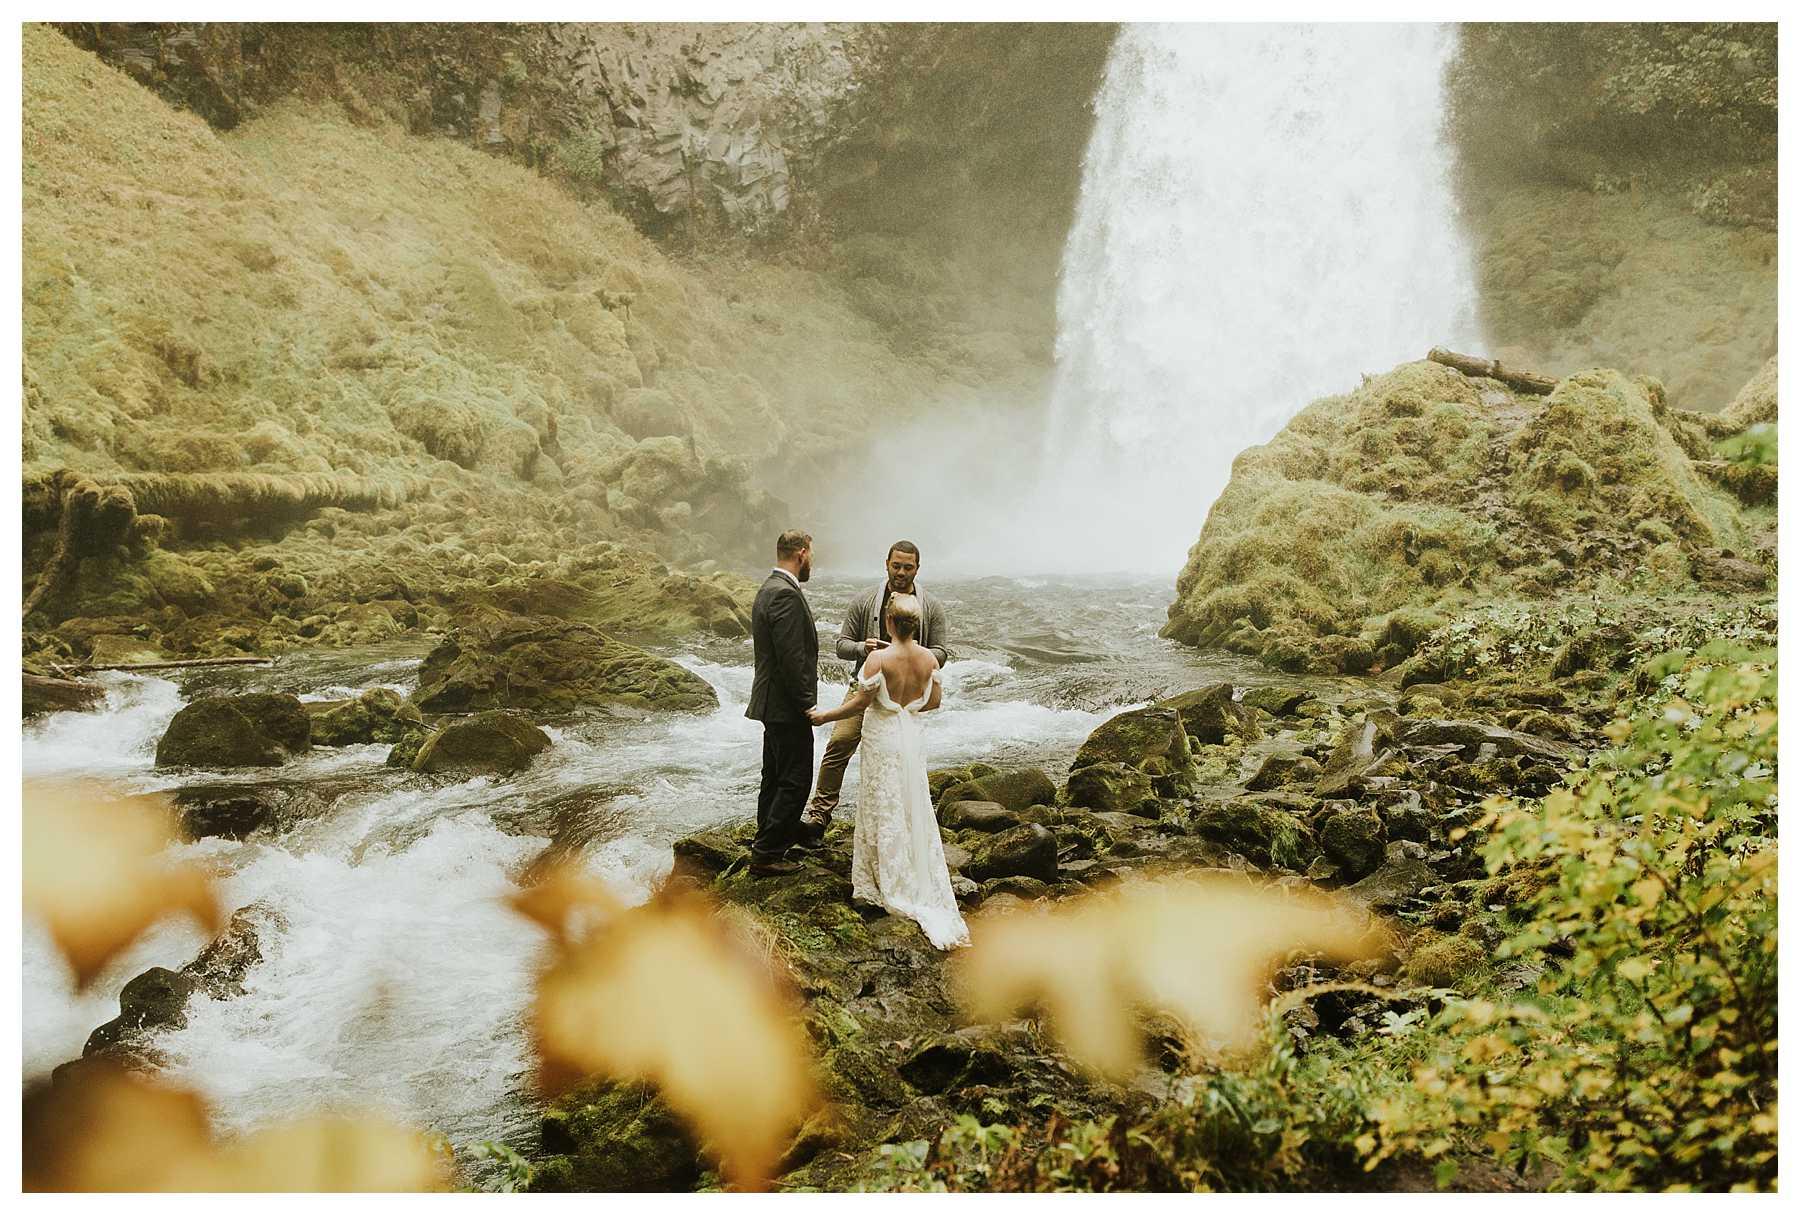 Oregon_Waterfall_Elopement_0016.jpg